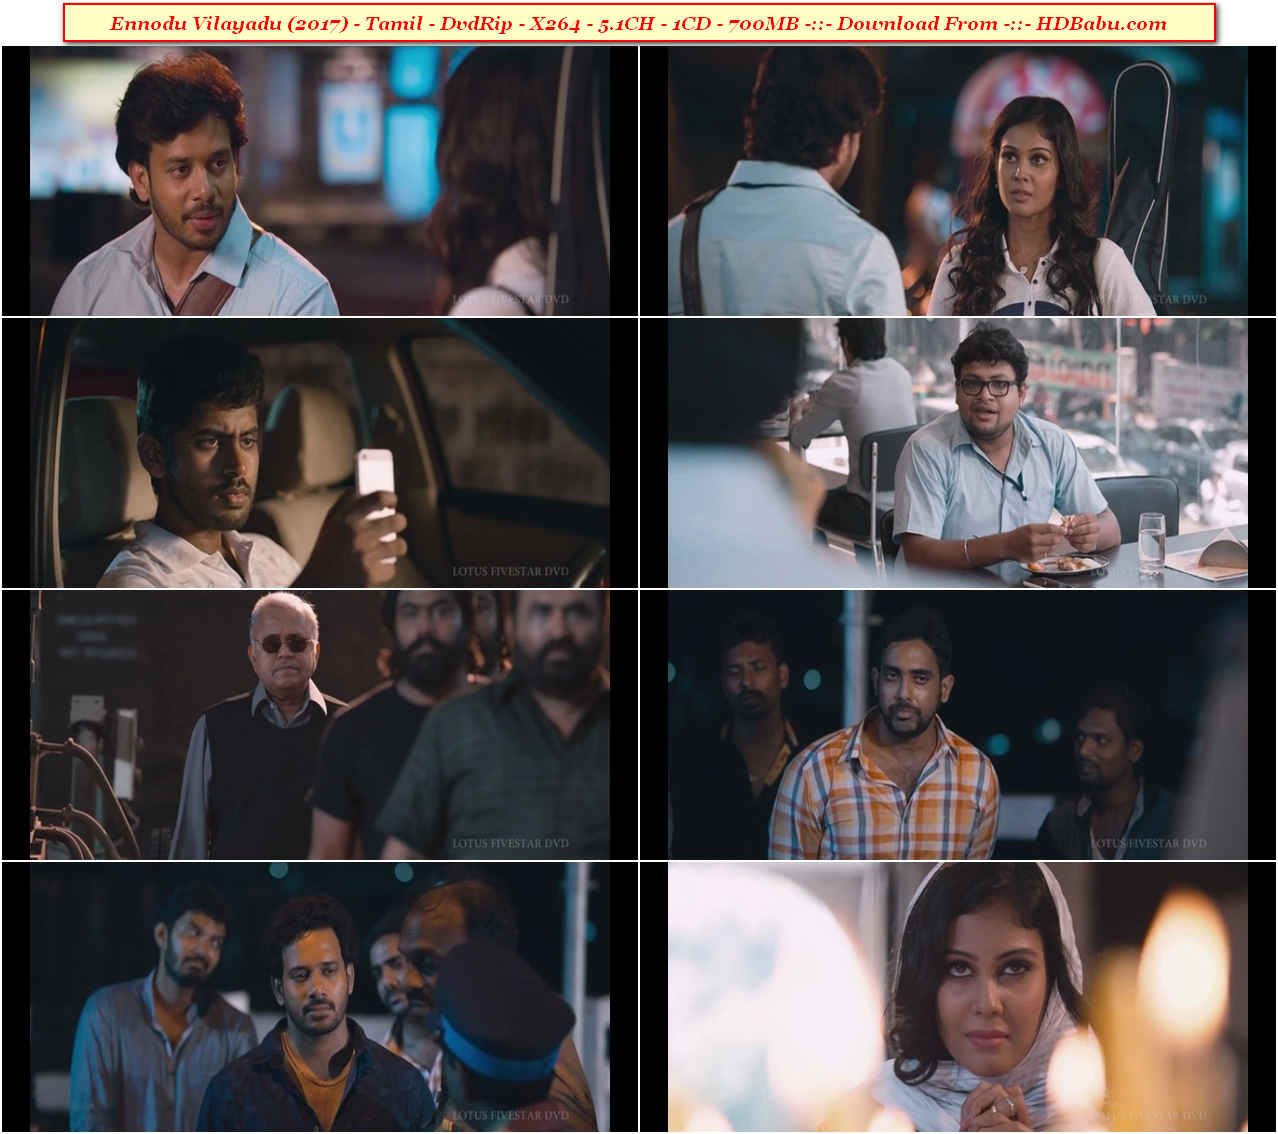 Ennodu Vilayadu Full Movie Download